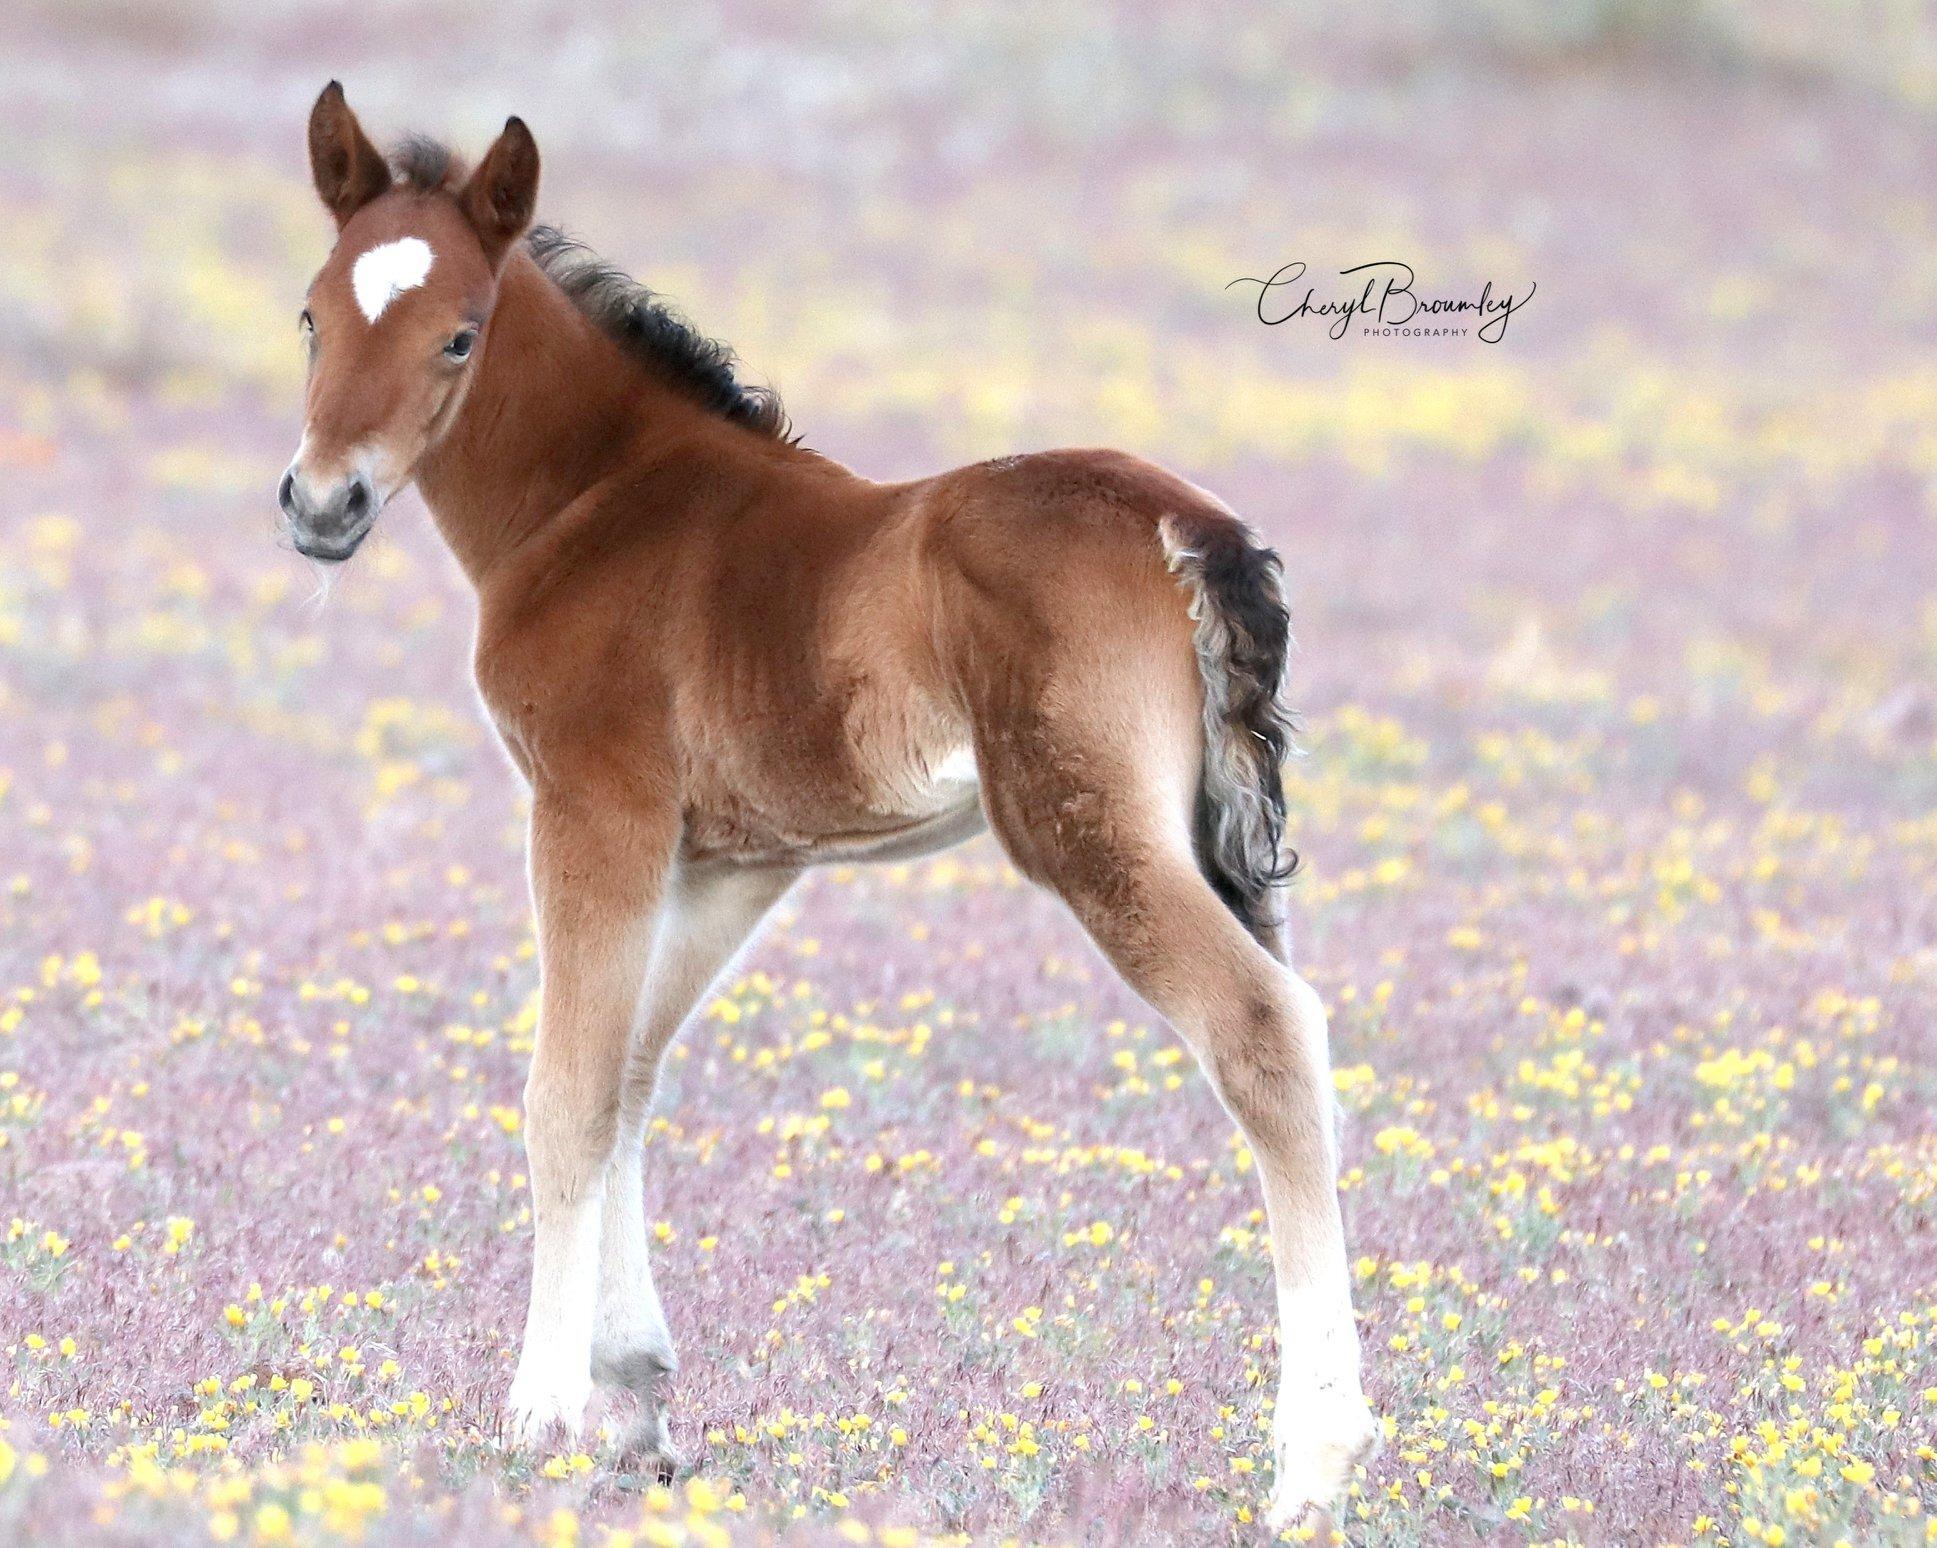 Cheryl Broumley - Nevada Wild Horse